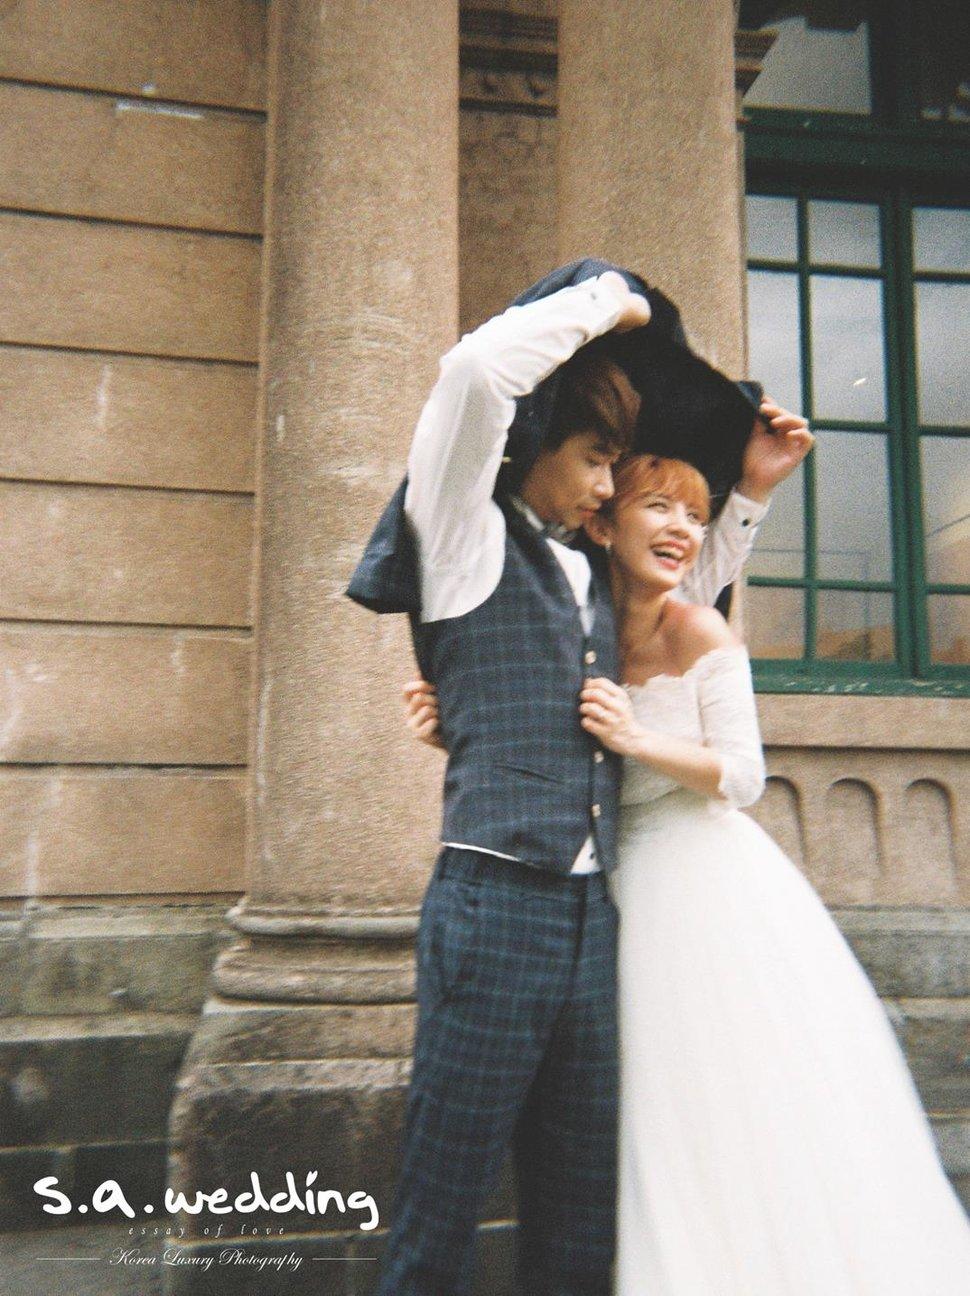 000023_ps (Copy) - s.a. wedding 韓國婚紗攝影《結婚吧》